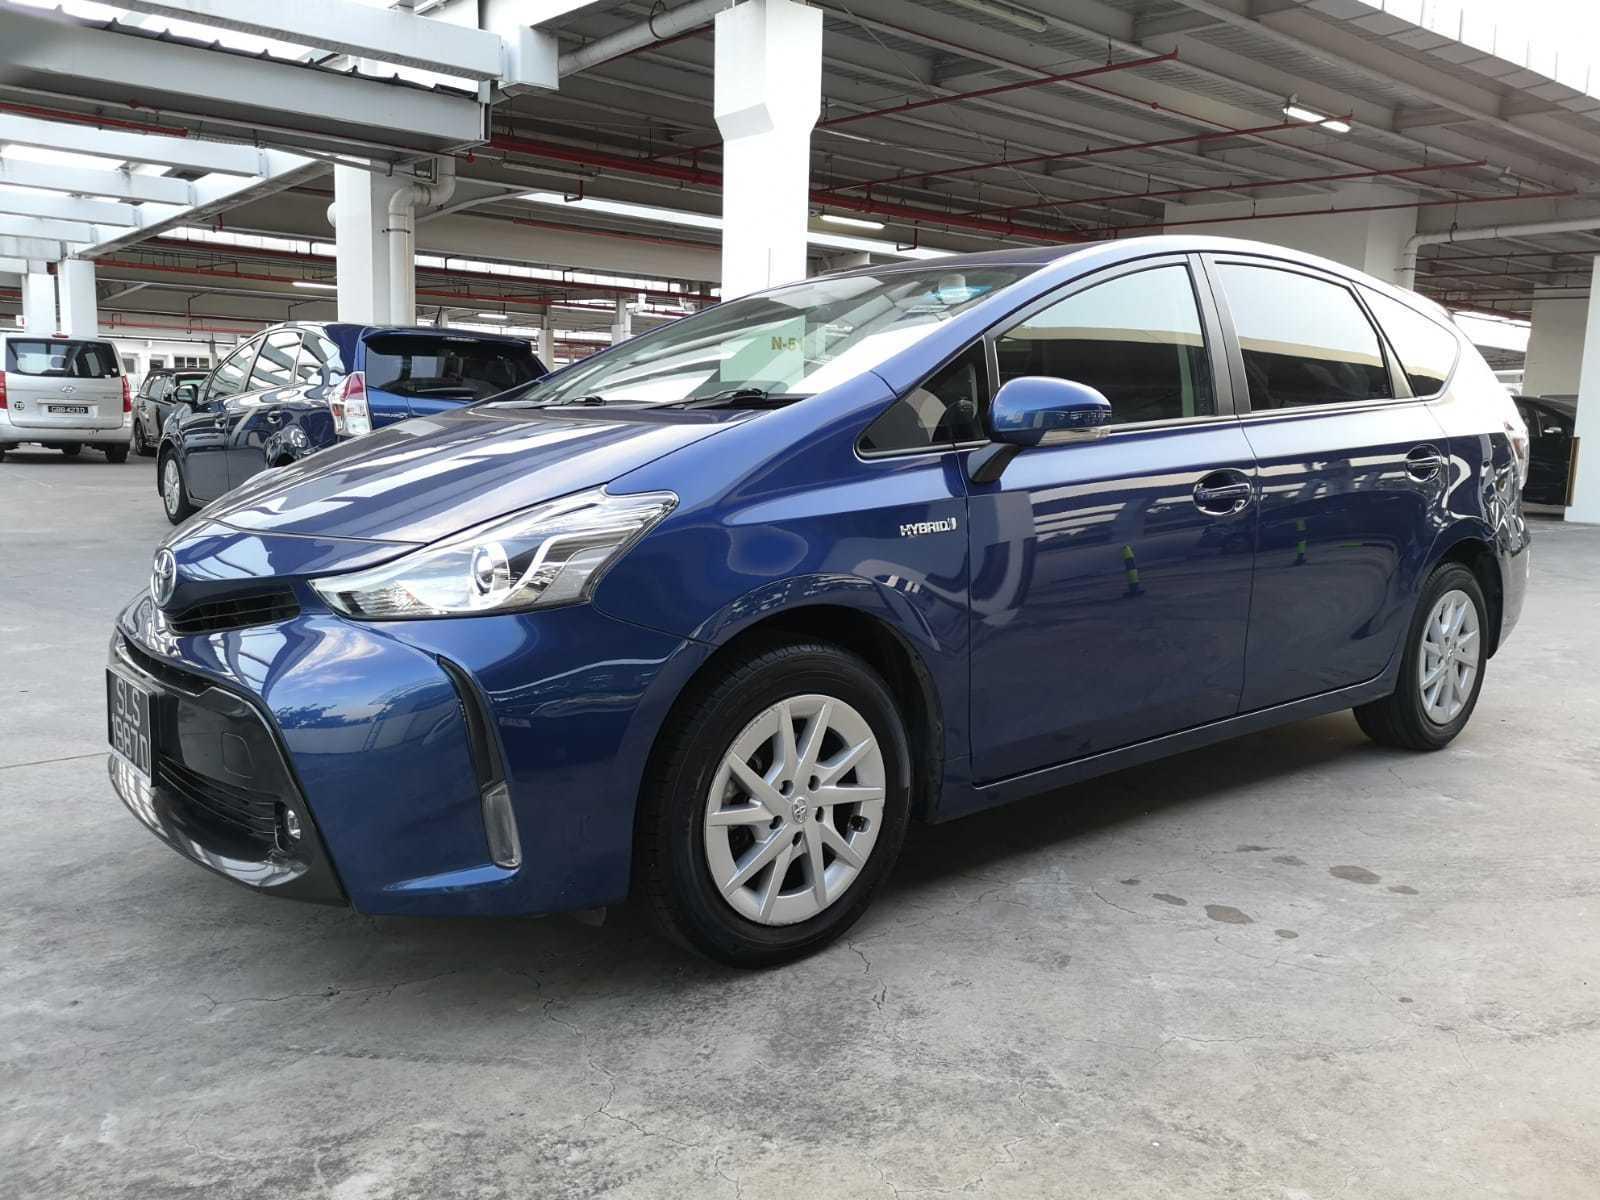 TOYOTA PRIUS ALPHA HYBRID 1.8S CVT, Cars, Vehicle Rentals ...